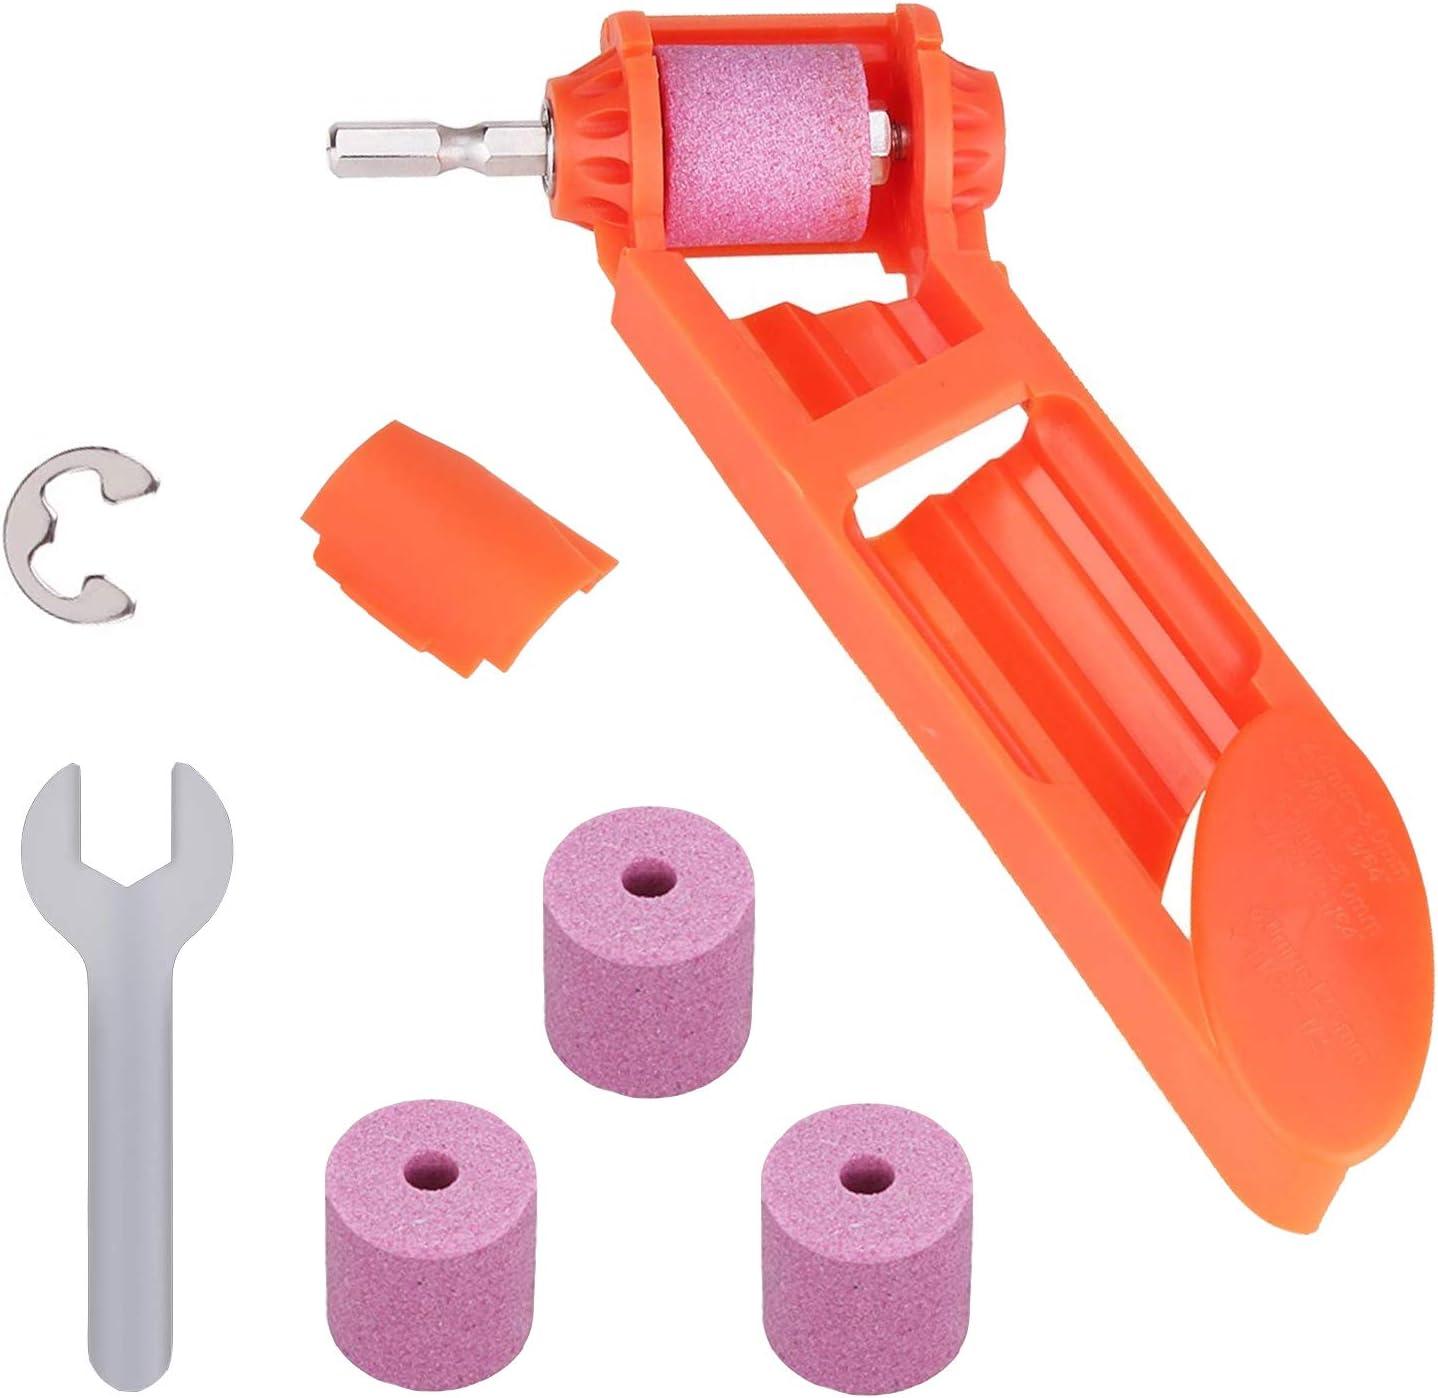 Drill Bit Sharpener Portable Diamond Drill Bit Sharpening Tool Corundum Grinding Wheel for Iron-based Drill Bits Fit Width Range-Orange